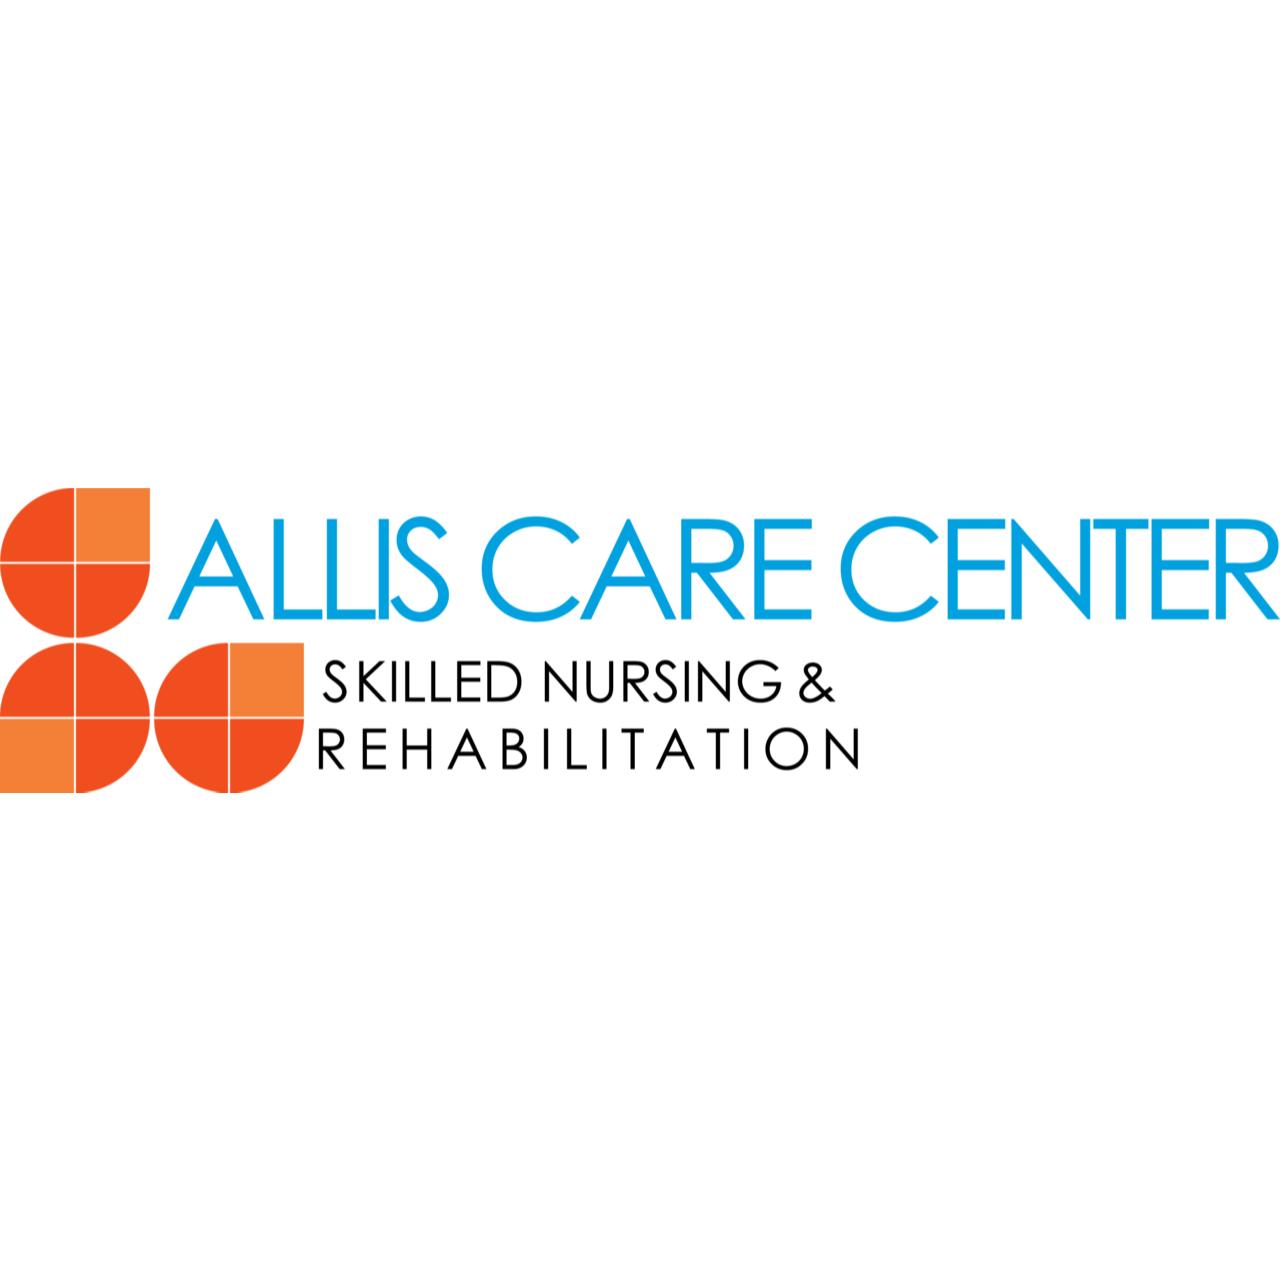 Allis Care Center